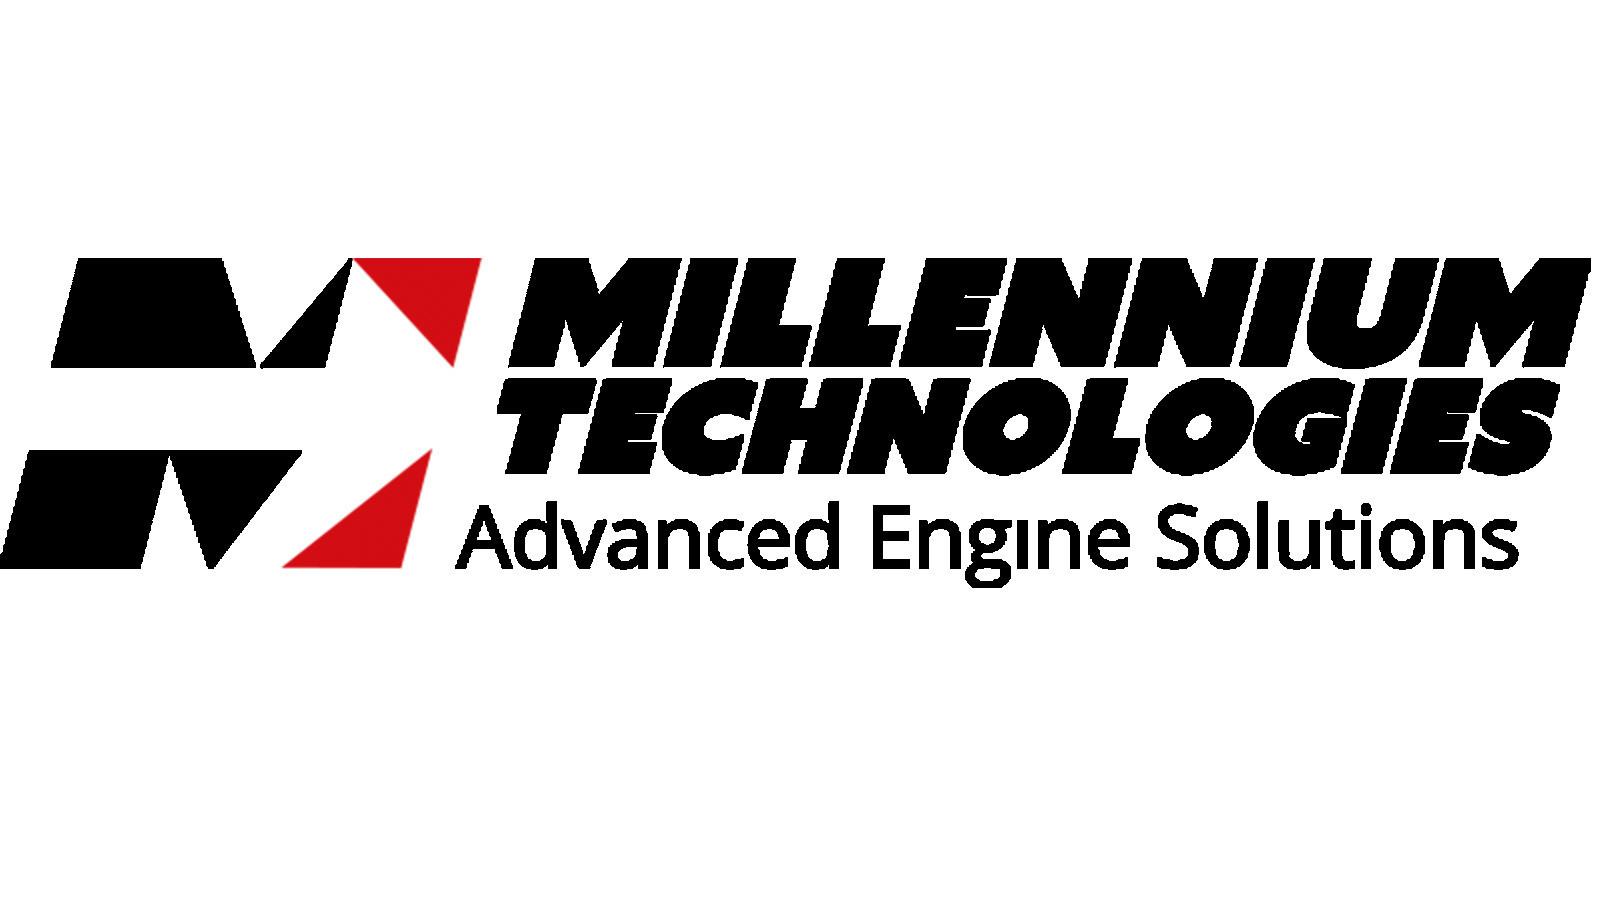 Millennium Technologies - Repair Not Replace